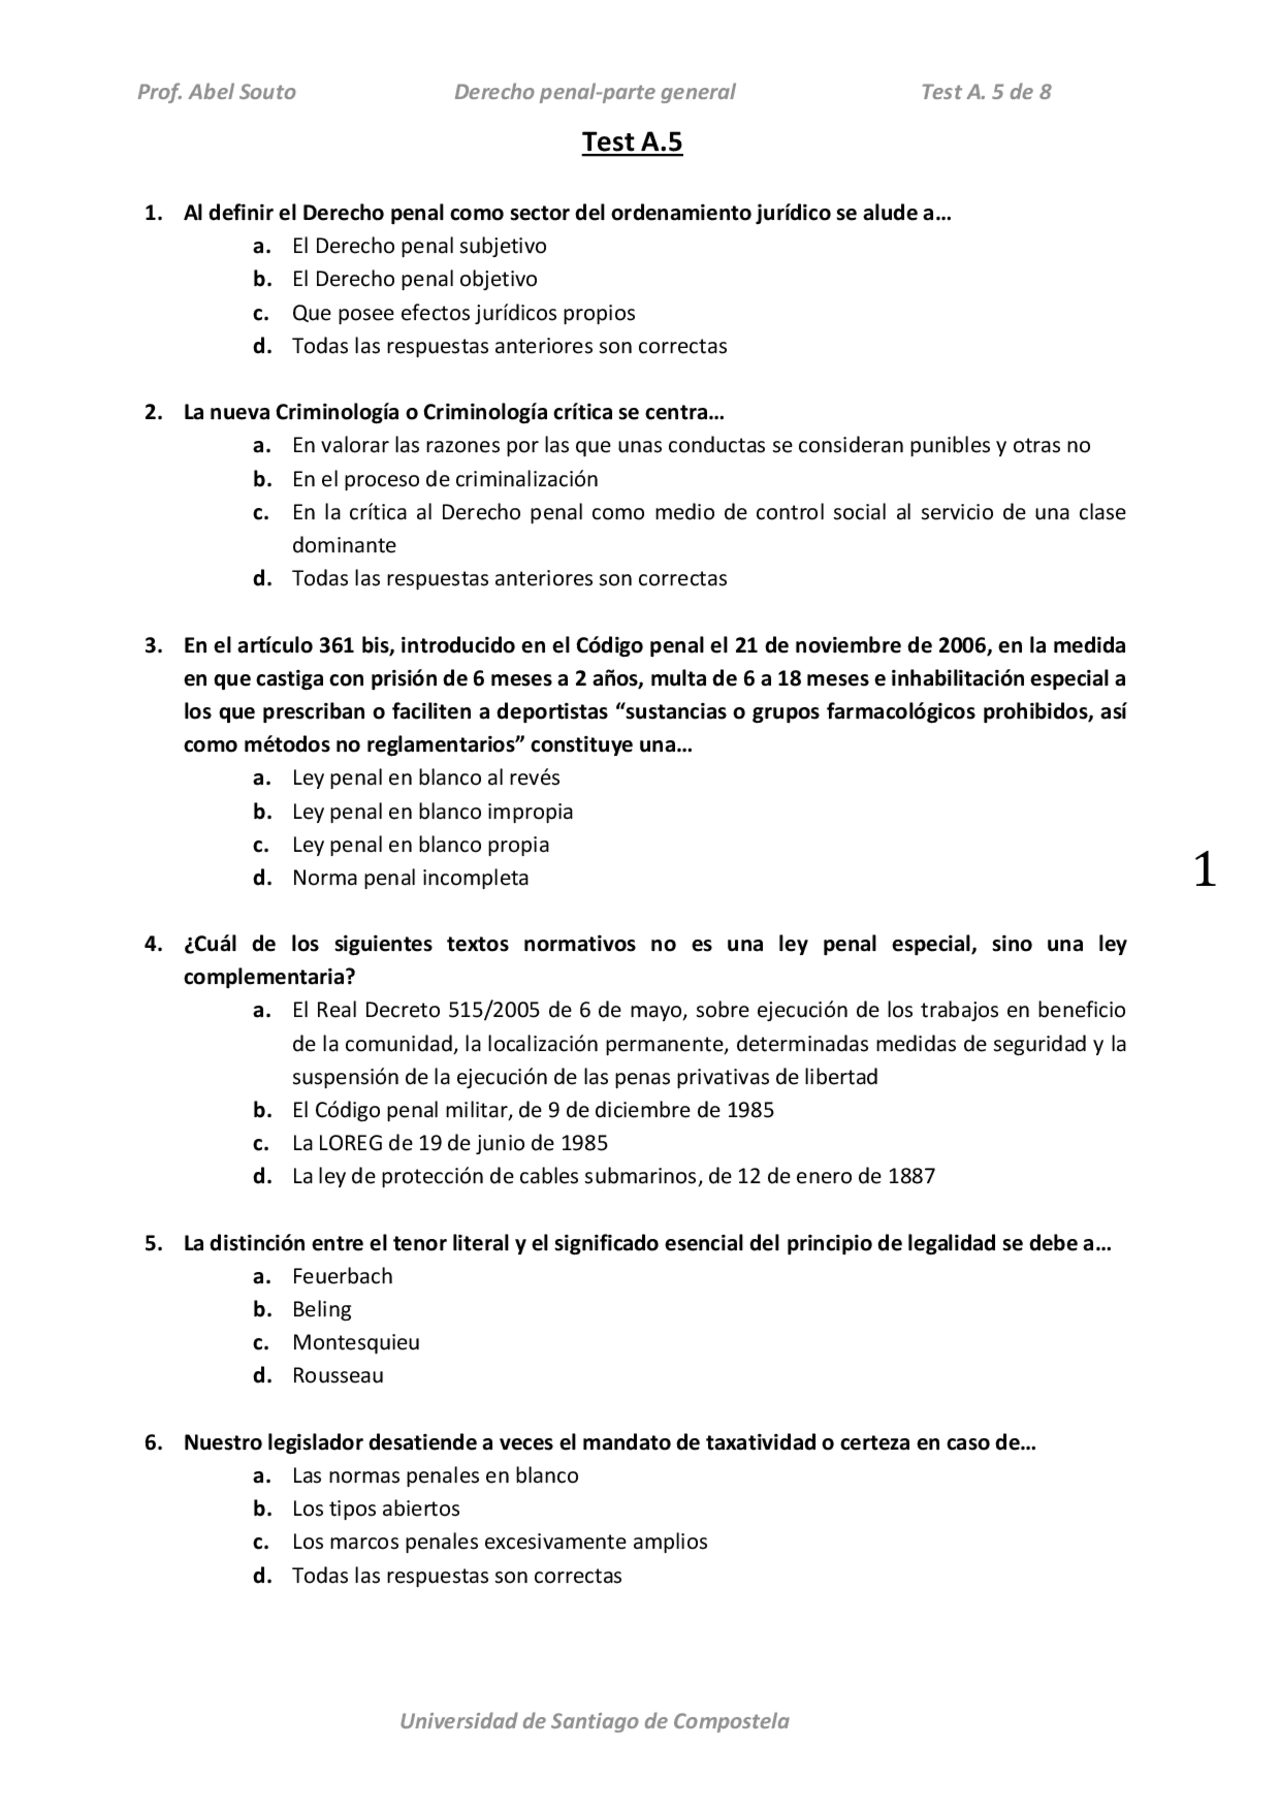 Test Examen Derecho Penal Exámenes De Derecho Penal Docsity